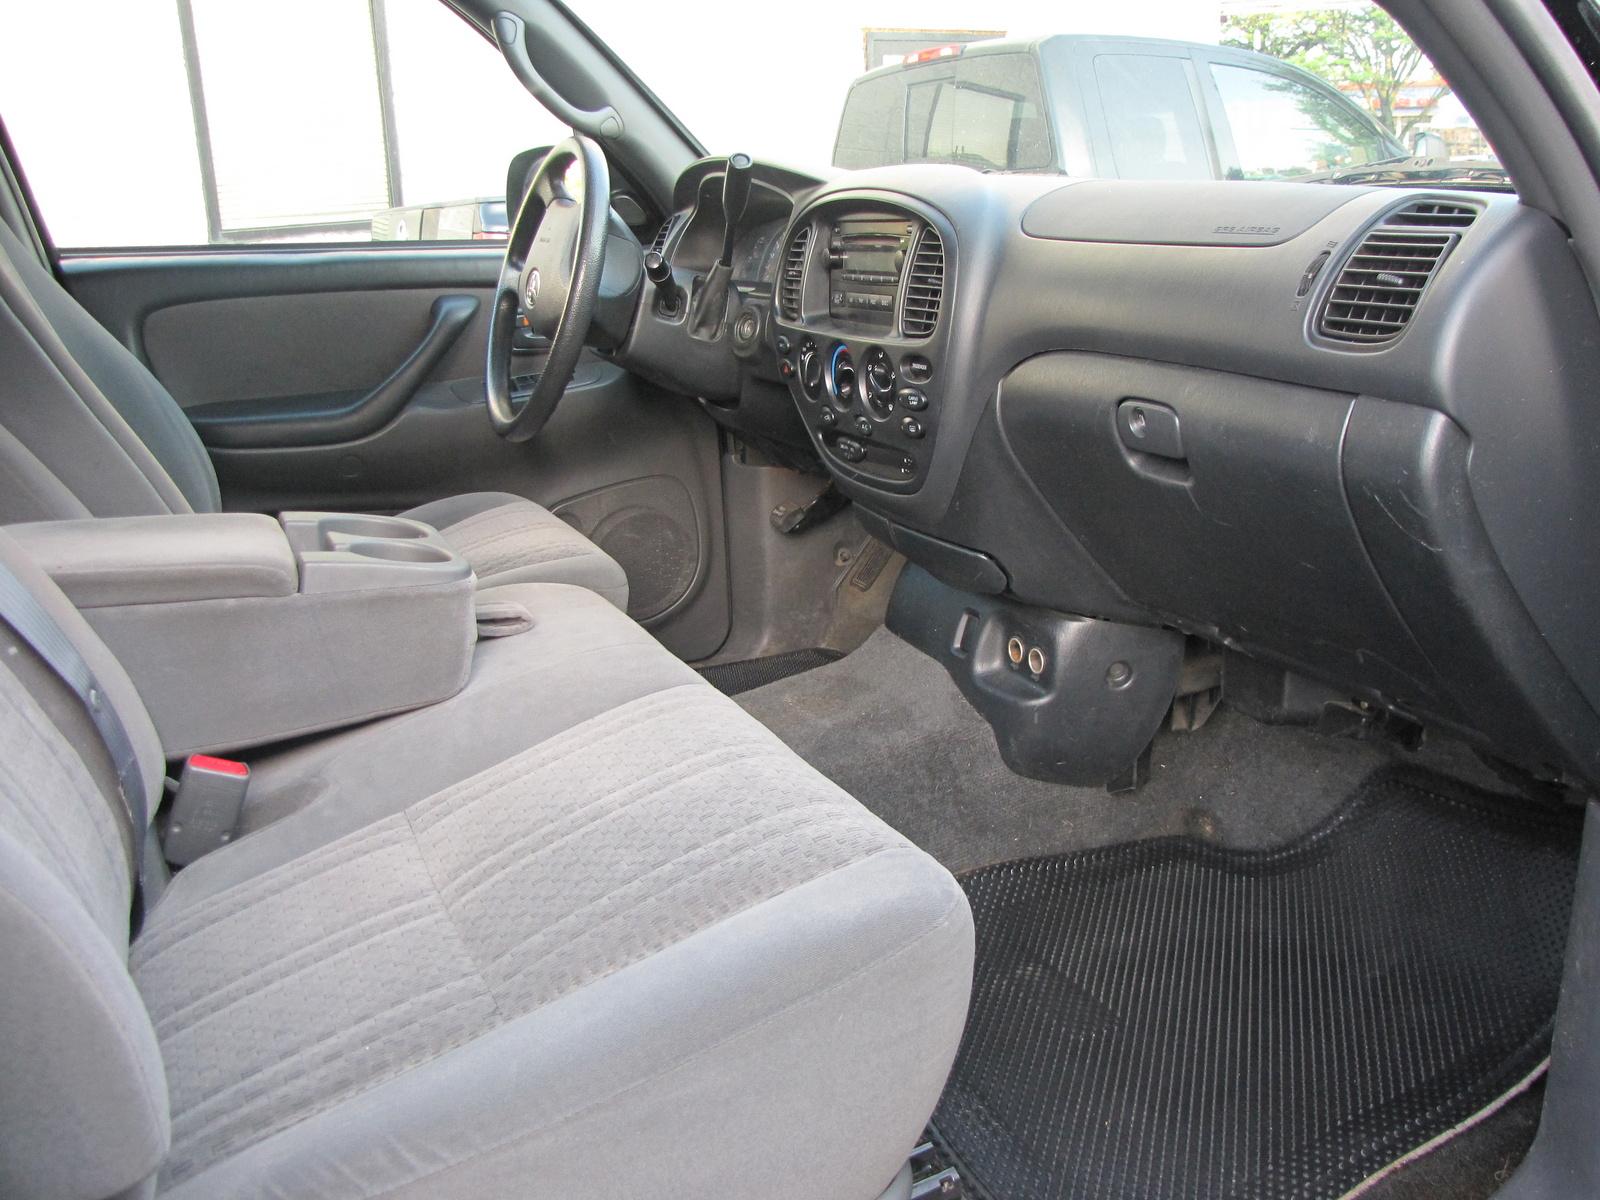 2006 Chevrolet Silverado 1500 Crew Cab >> 2005 Toyota Tundra - Pictures - CarGurus